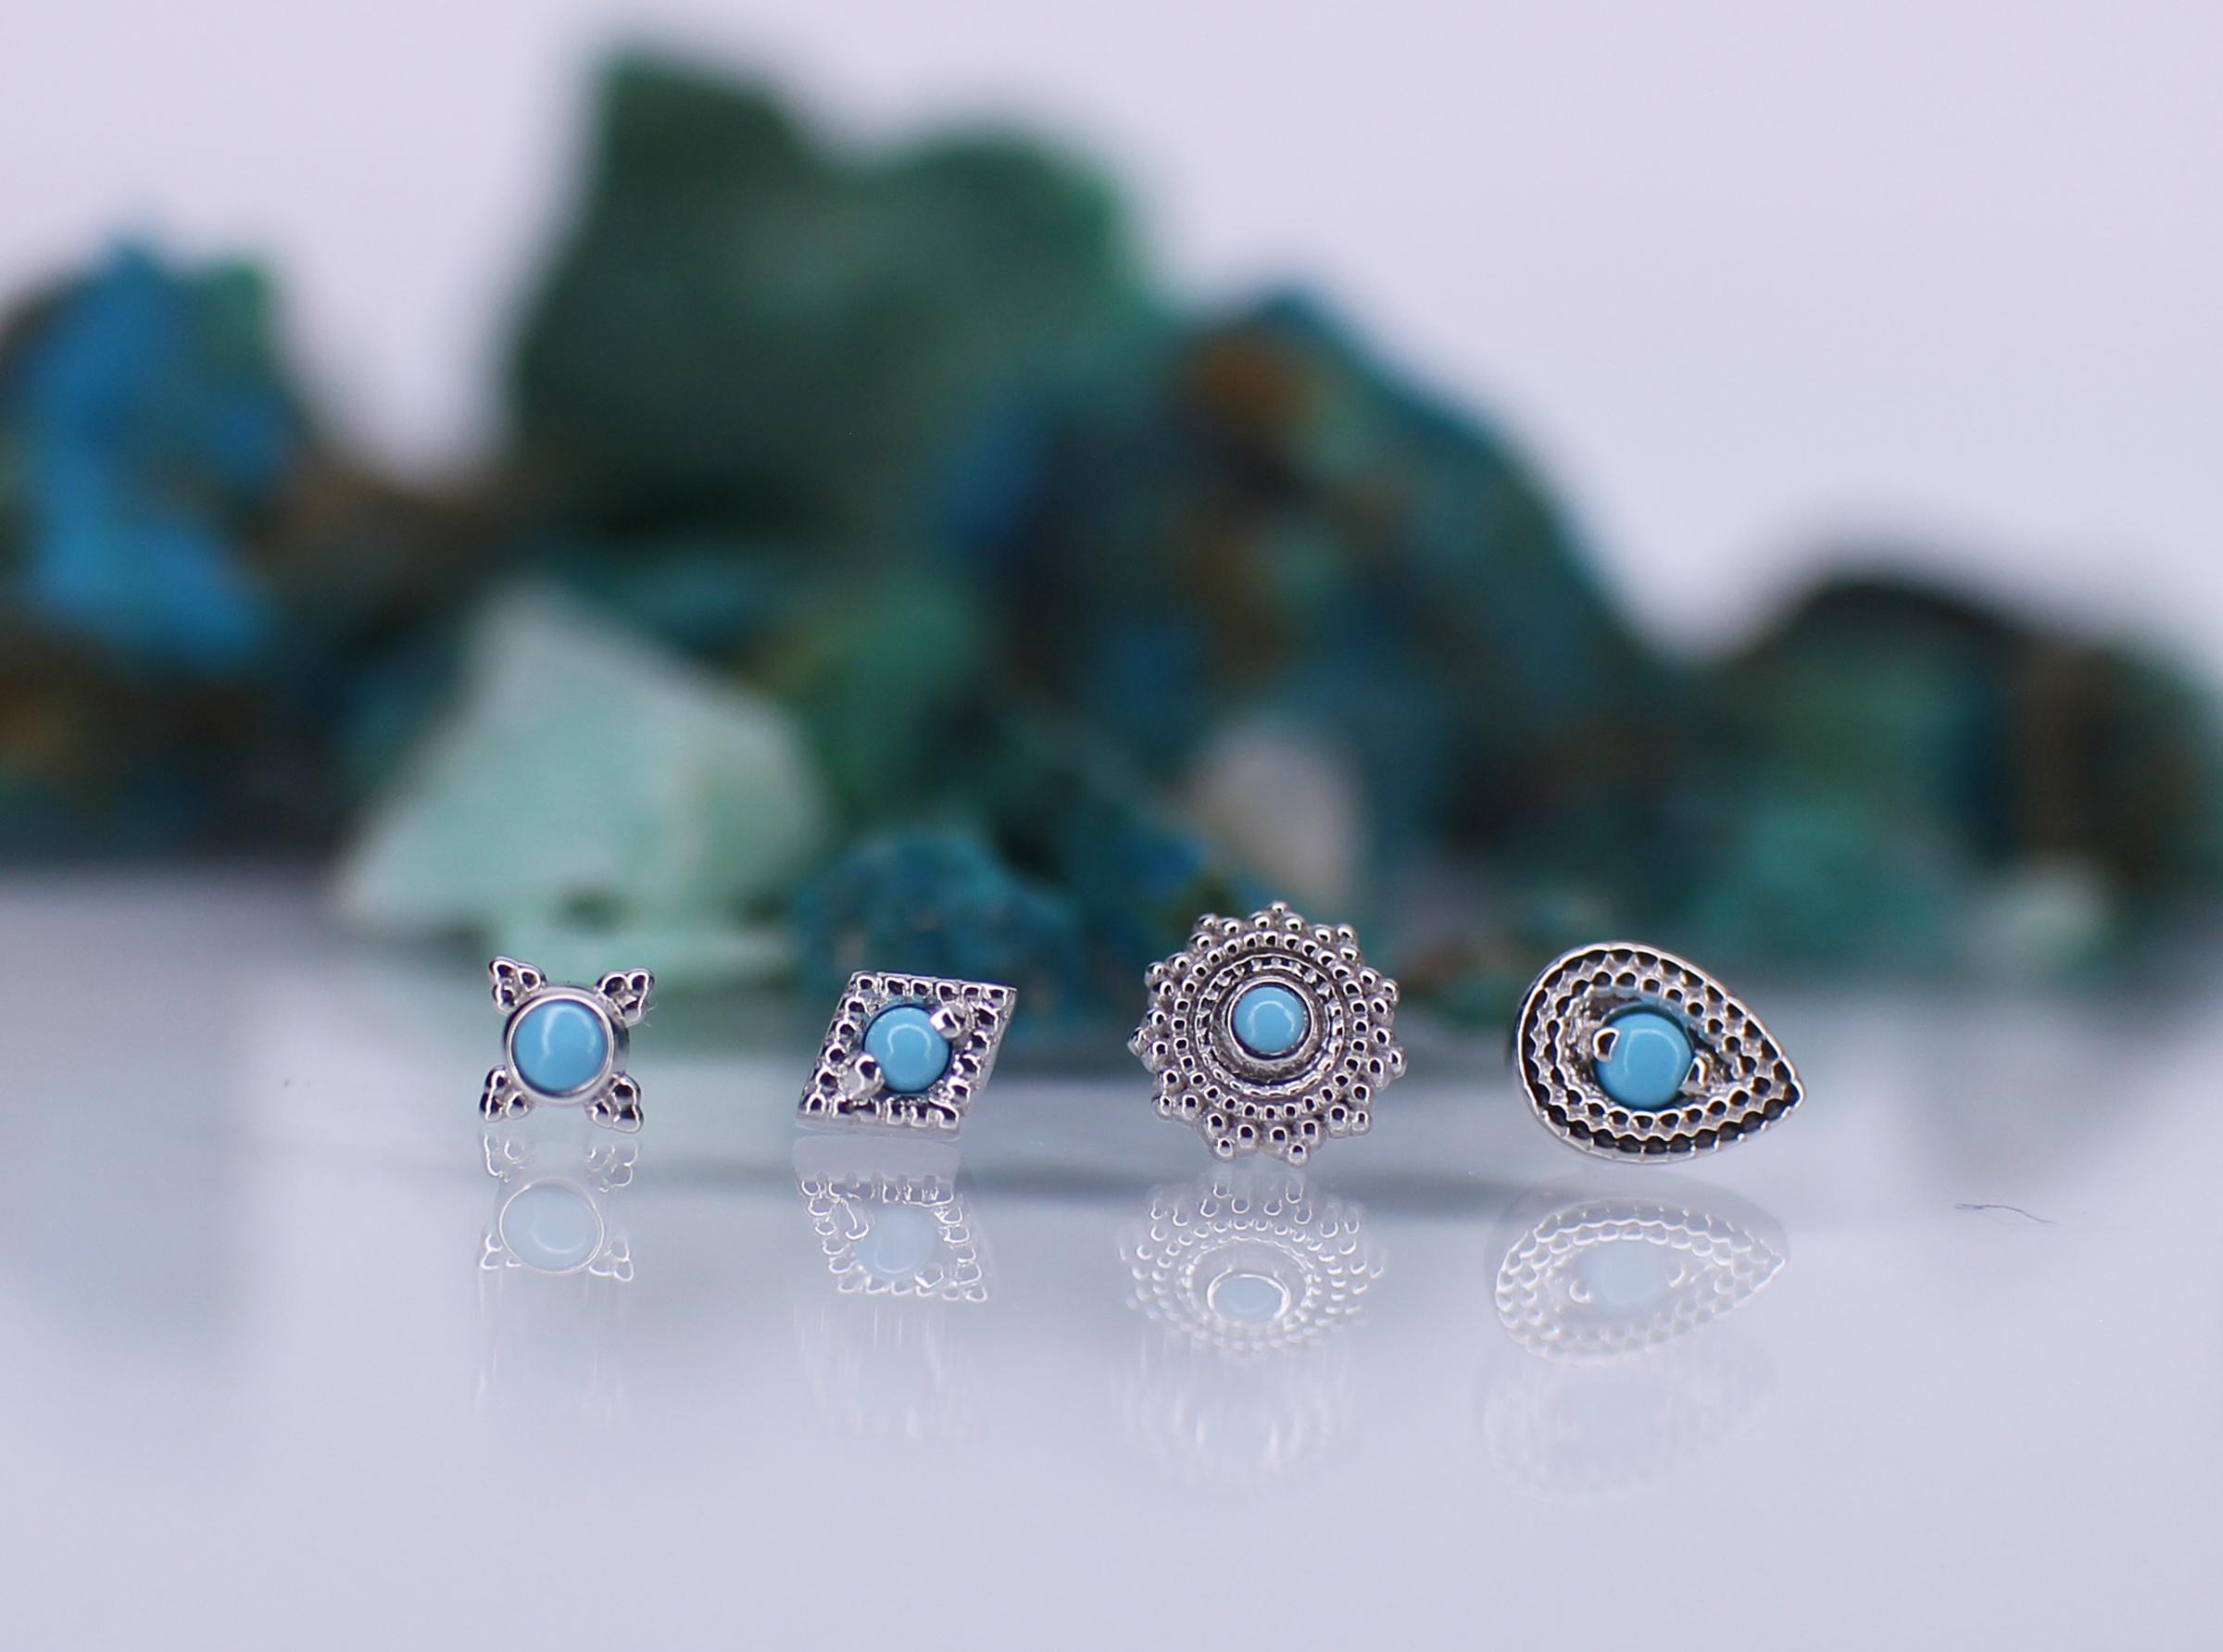 Jewelry IMG_9301 WG Kandy Afghan Turquoise.jpg